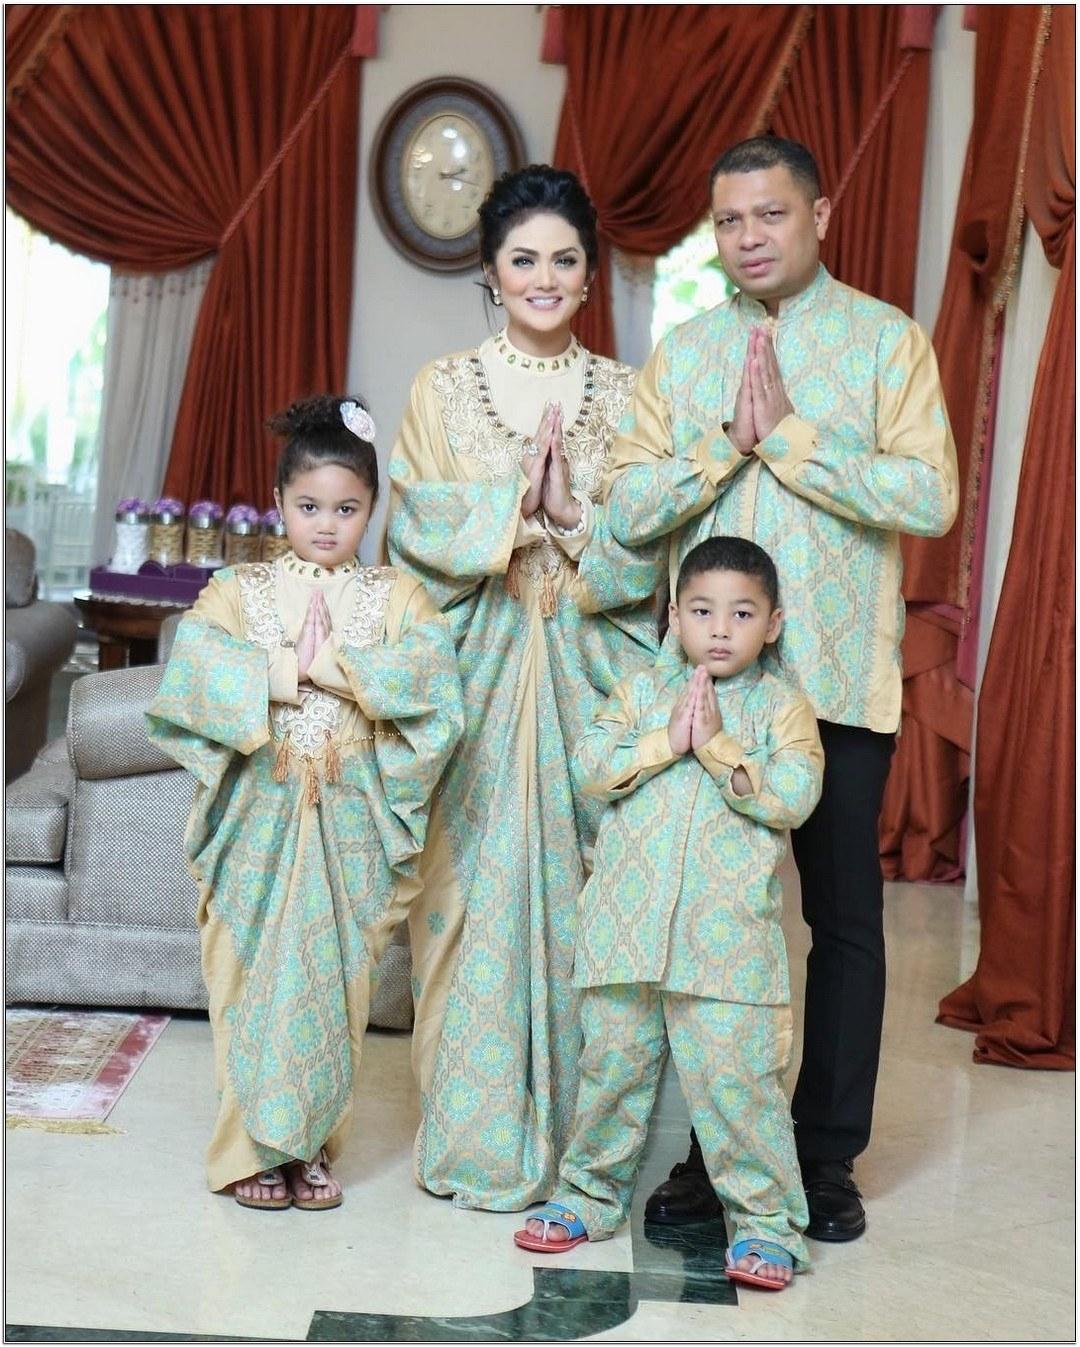 Model Model Baju Lebaran Syahrini Mndw Model Baju Seragam Lebaran Artis